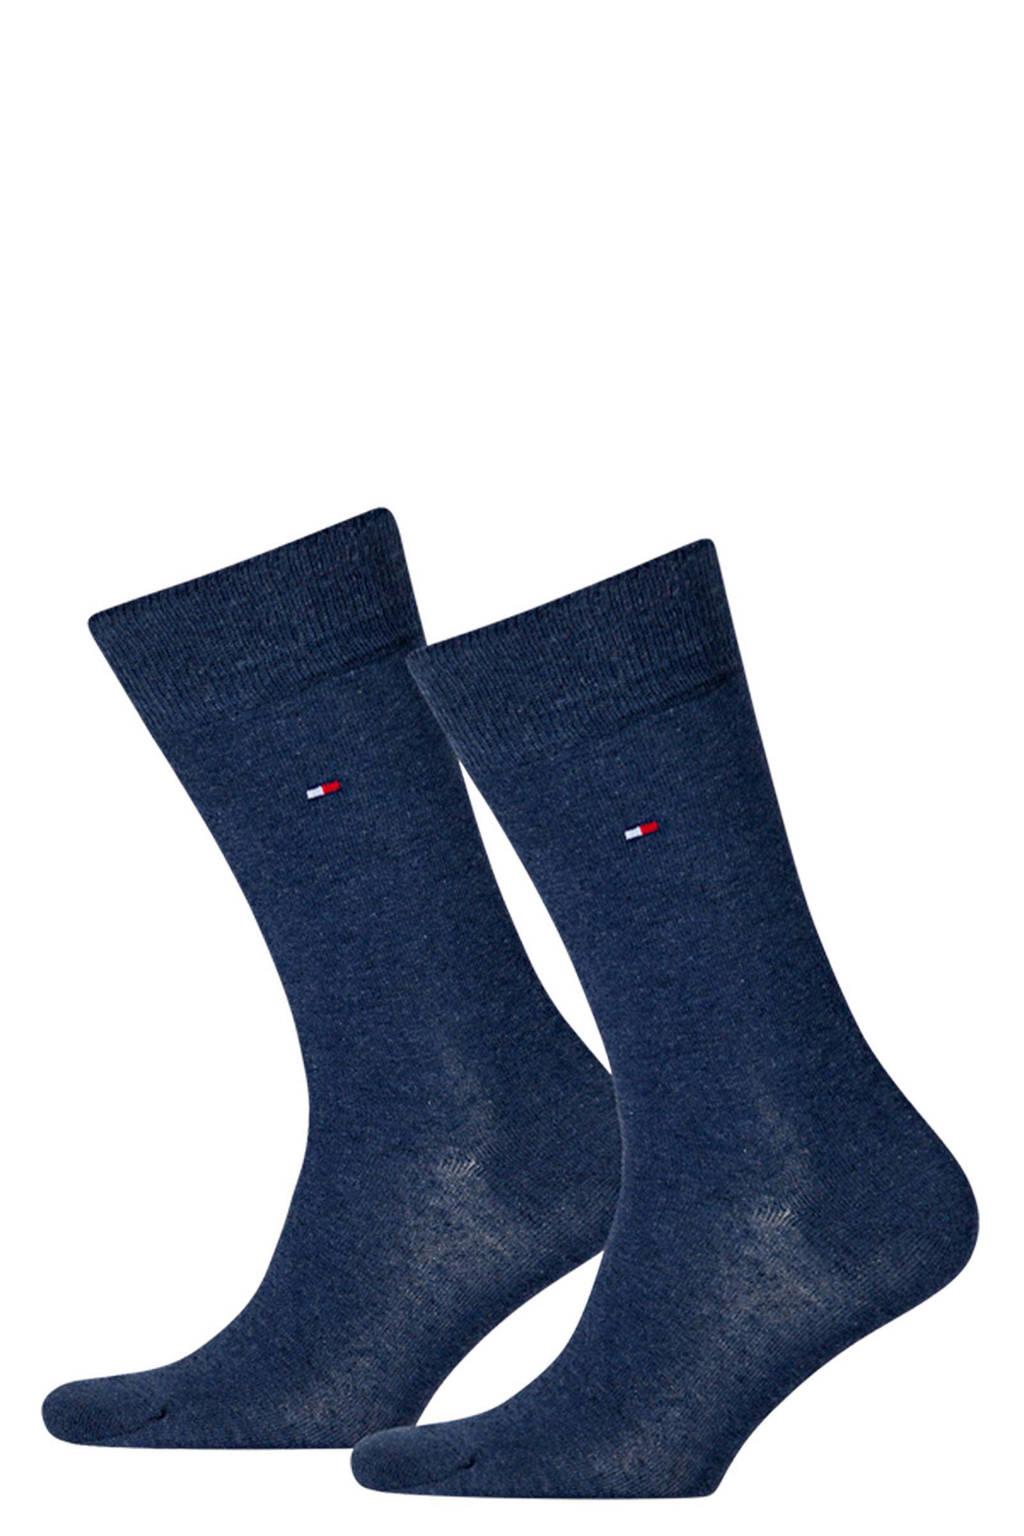 Tommy Hilfiger sokken (2 paar), Indigo